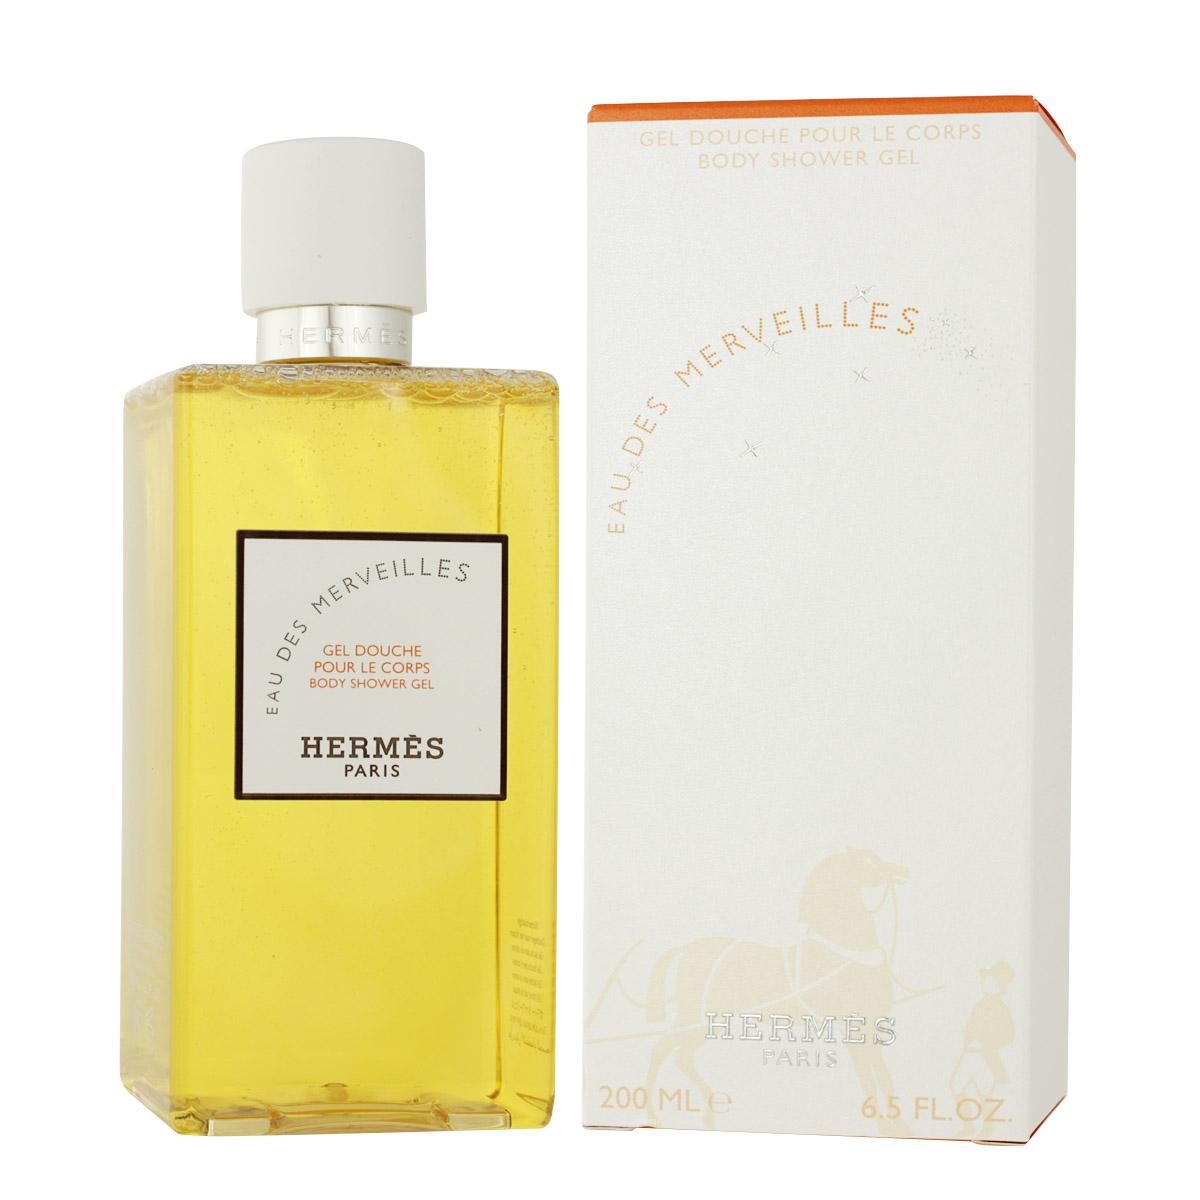 Hermès Eau des Merveilles SG 200 ml W